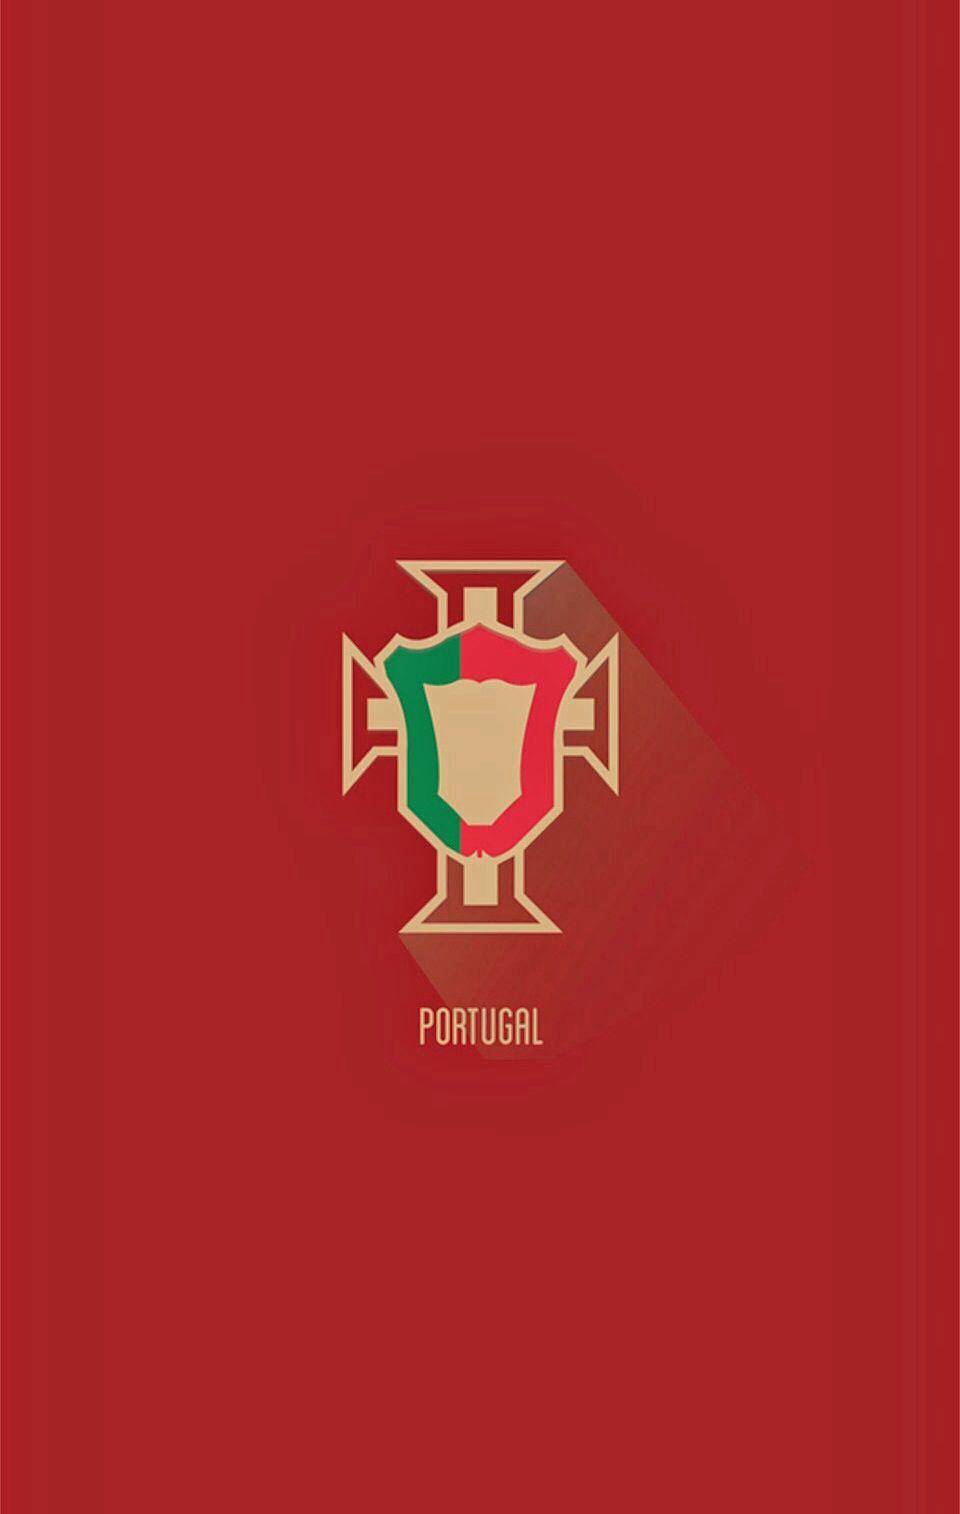 World Cup Portugal   Portugal, Fond ecran, Simpsons